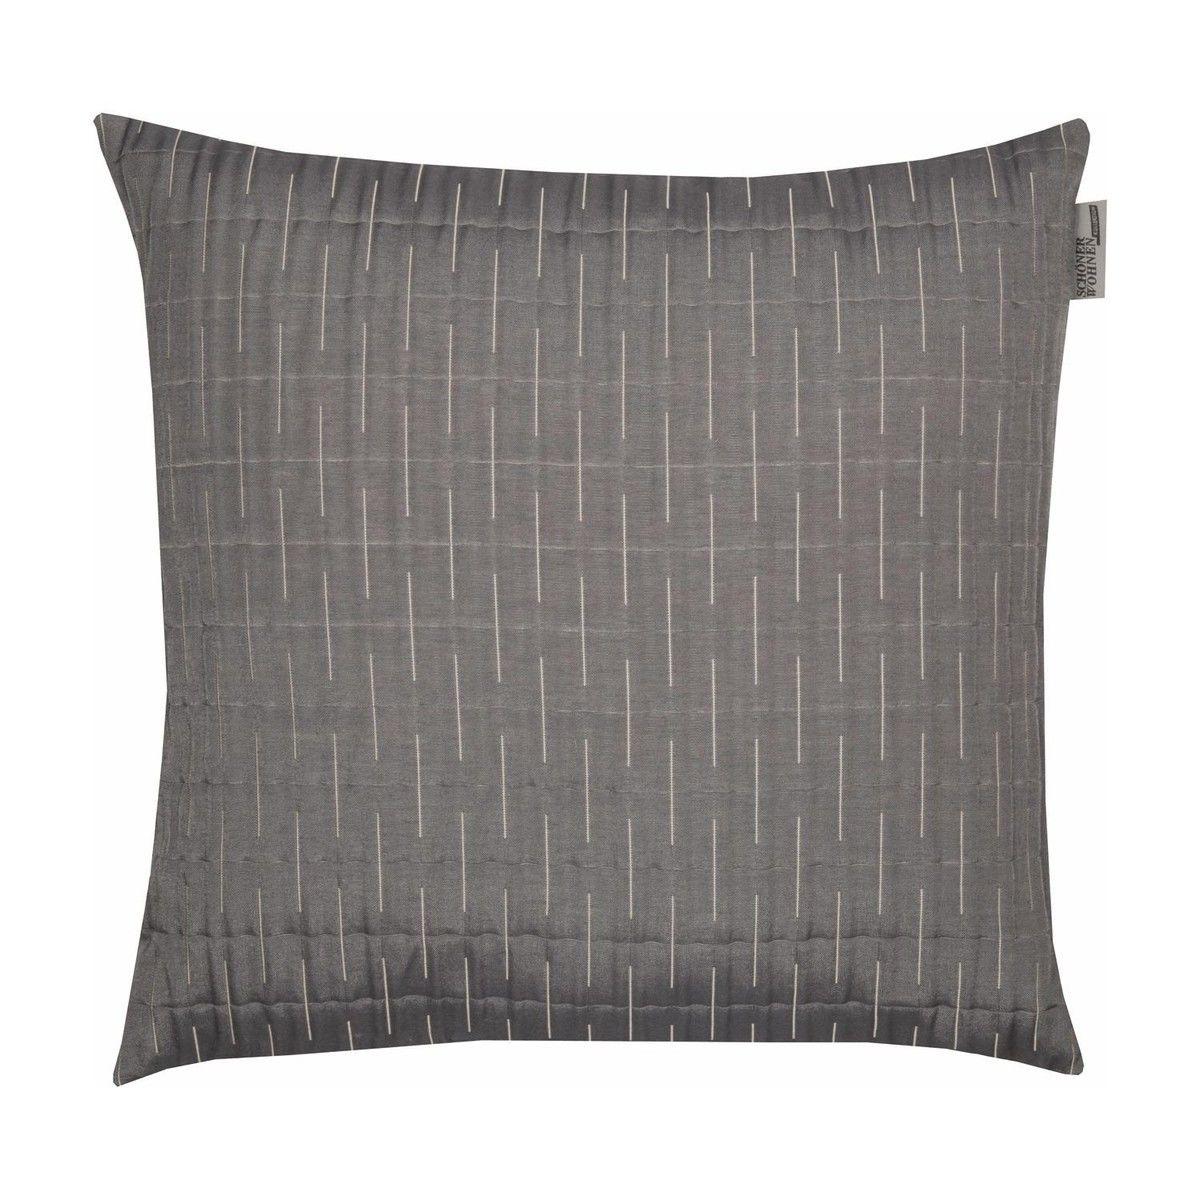 cut kissenh lle 48x48cm sch ner wohnen kollektion. Black Bedroom Furniture Sets. Home Design Ideas